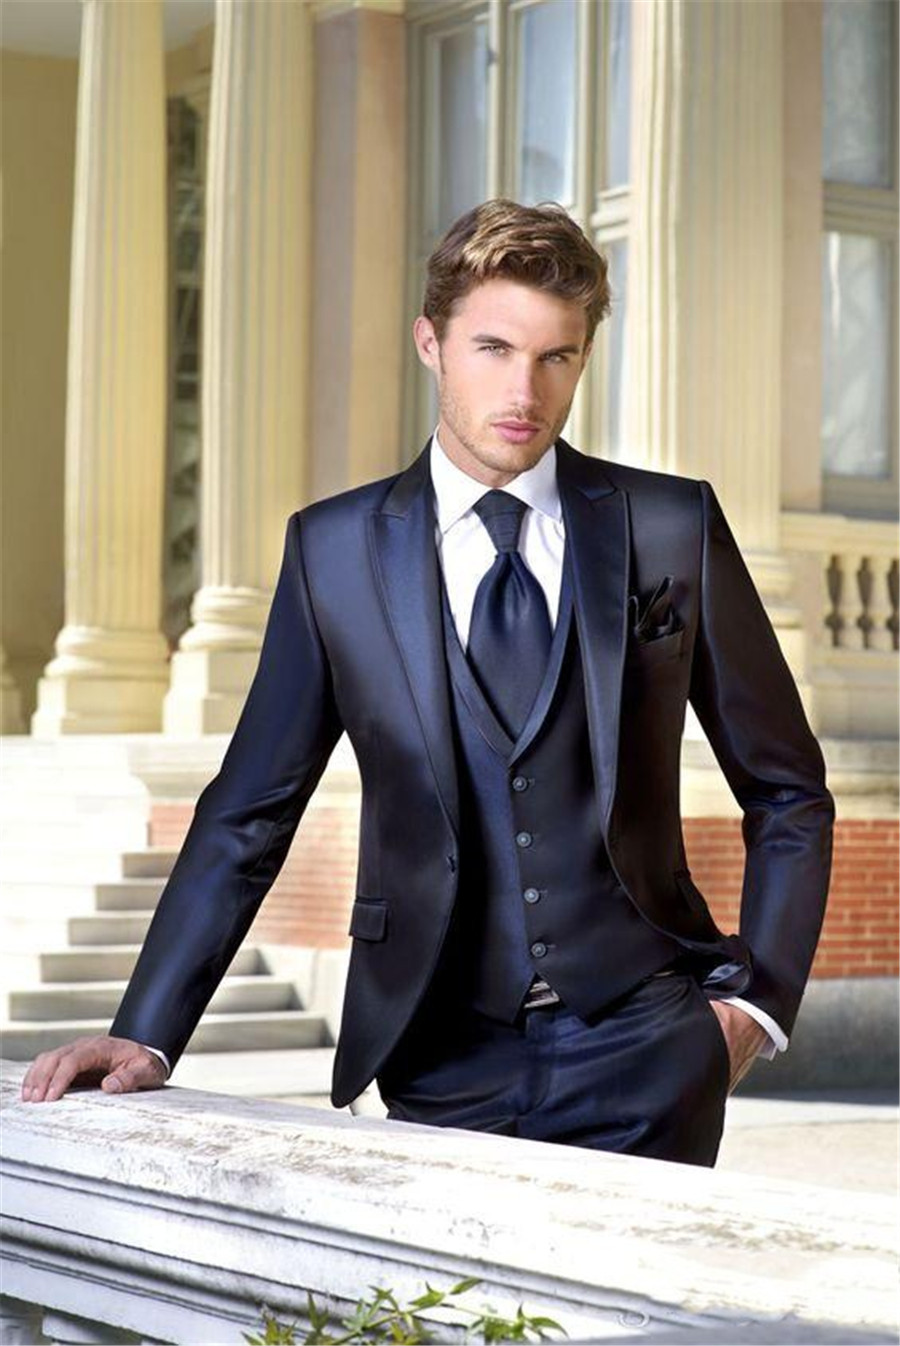 High Quality Navy Wedding Tuxedos Slim Fit Suits For Men Handsome Groomsmen Groom Men Suit Three Pieces (Jacket+Pants+Vest)